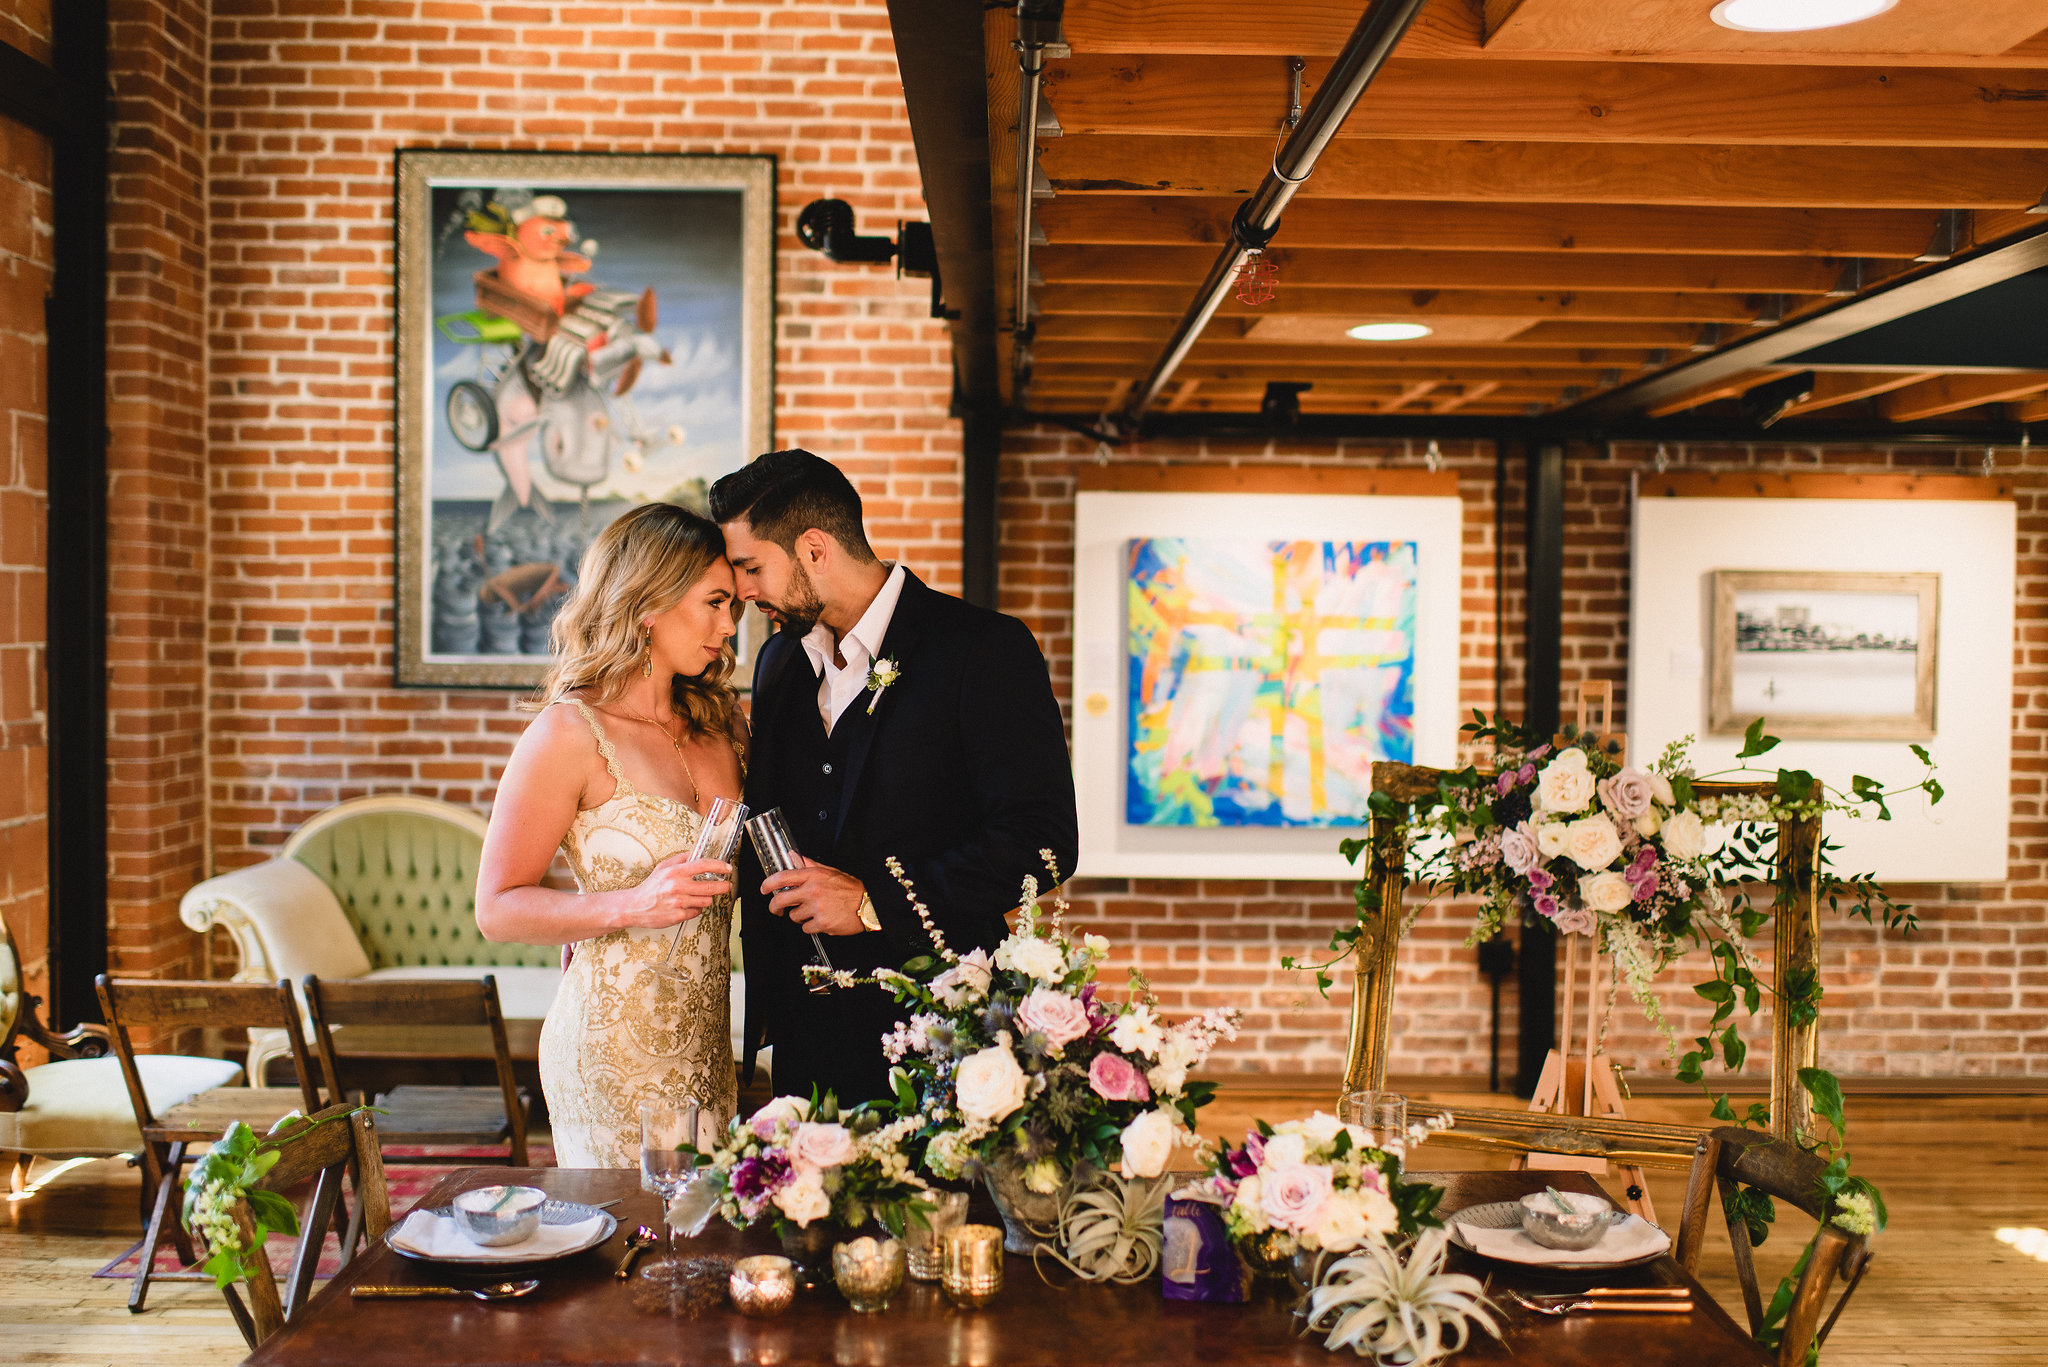 Sparks-gallery-wedding-photos-65.jpg